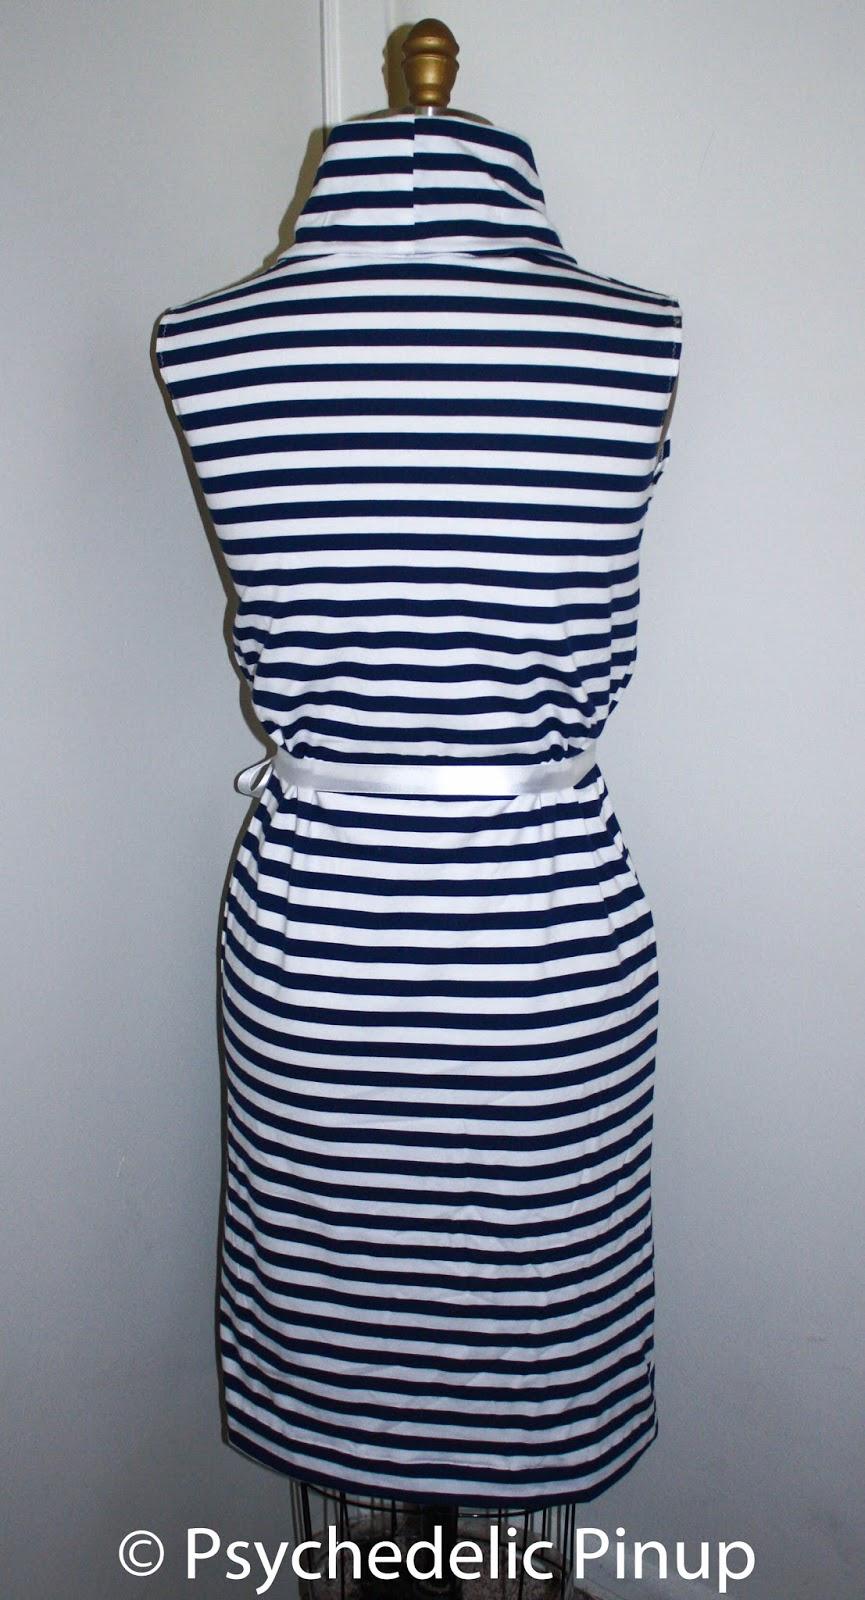 b3cce00a4e Morningstar Pinup  Marilyn Monroe Casual Knit Wear- Stripe Dress ...